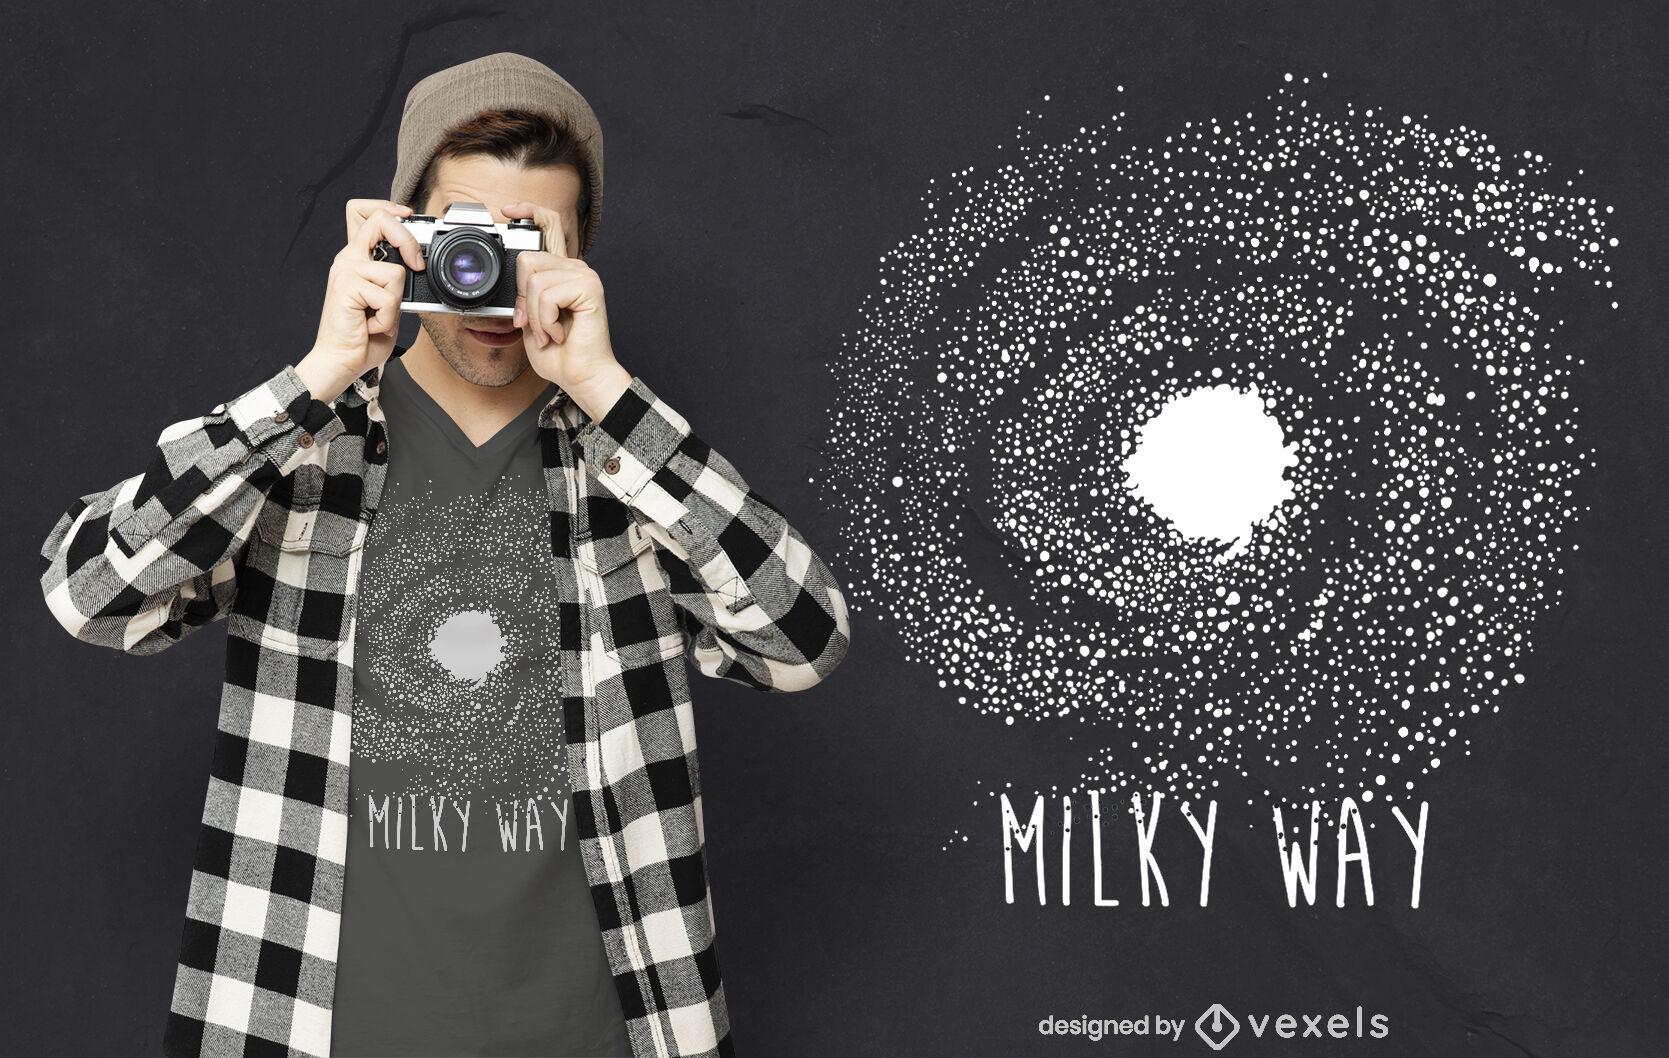 Milky way quote t-shirt design